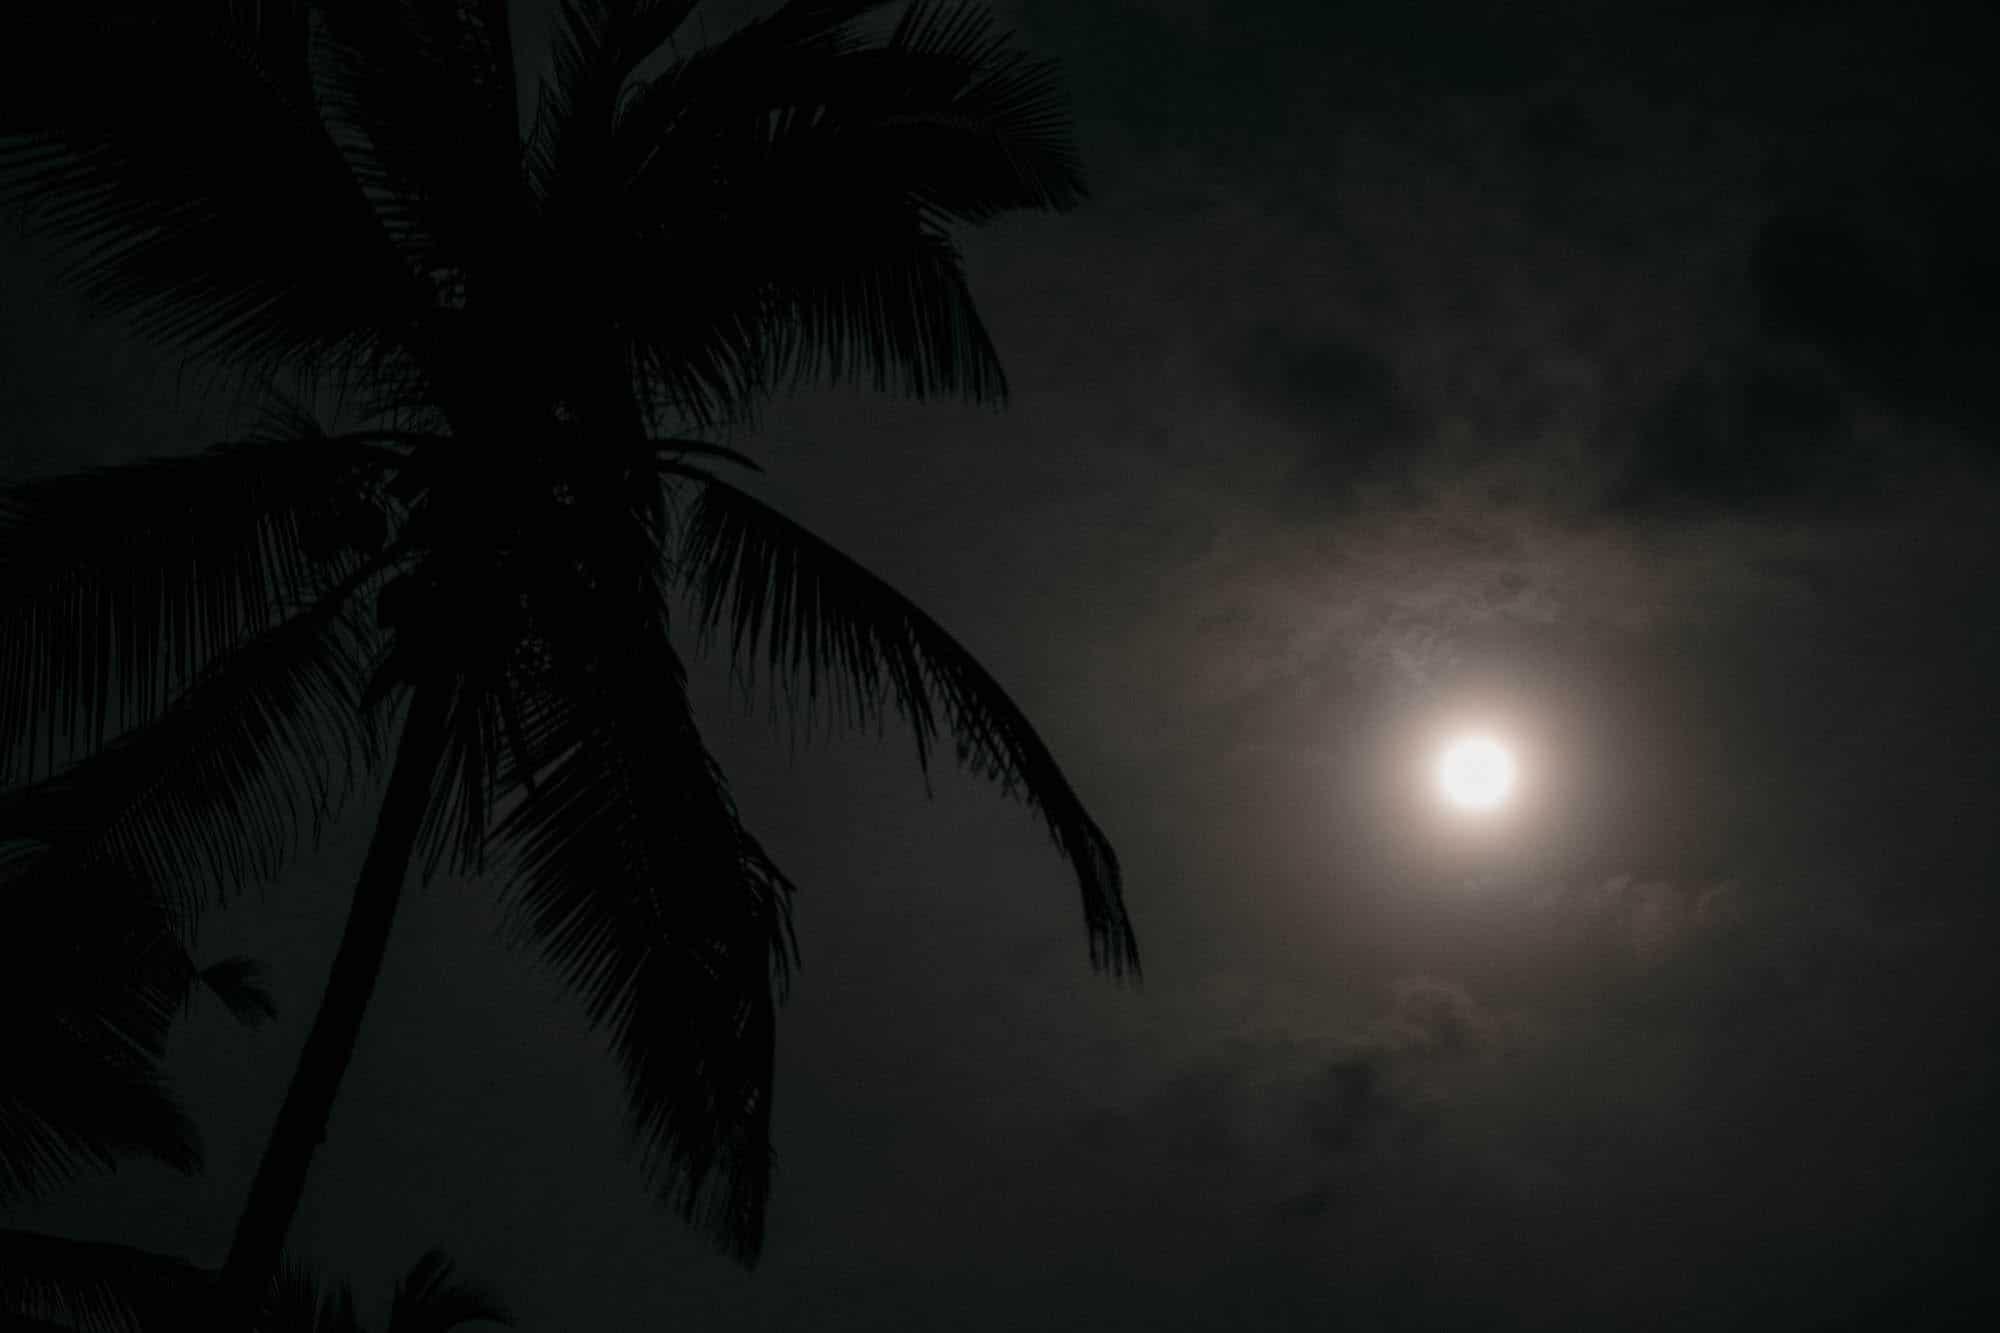 Poya Day Vollmond mit Palme in Ranna, Sri Lanka